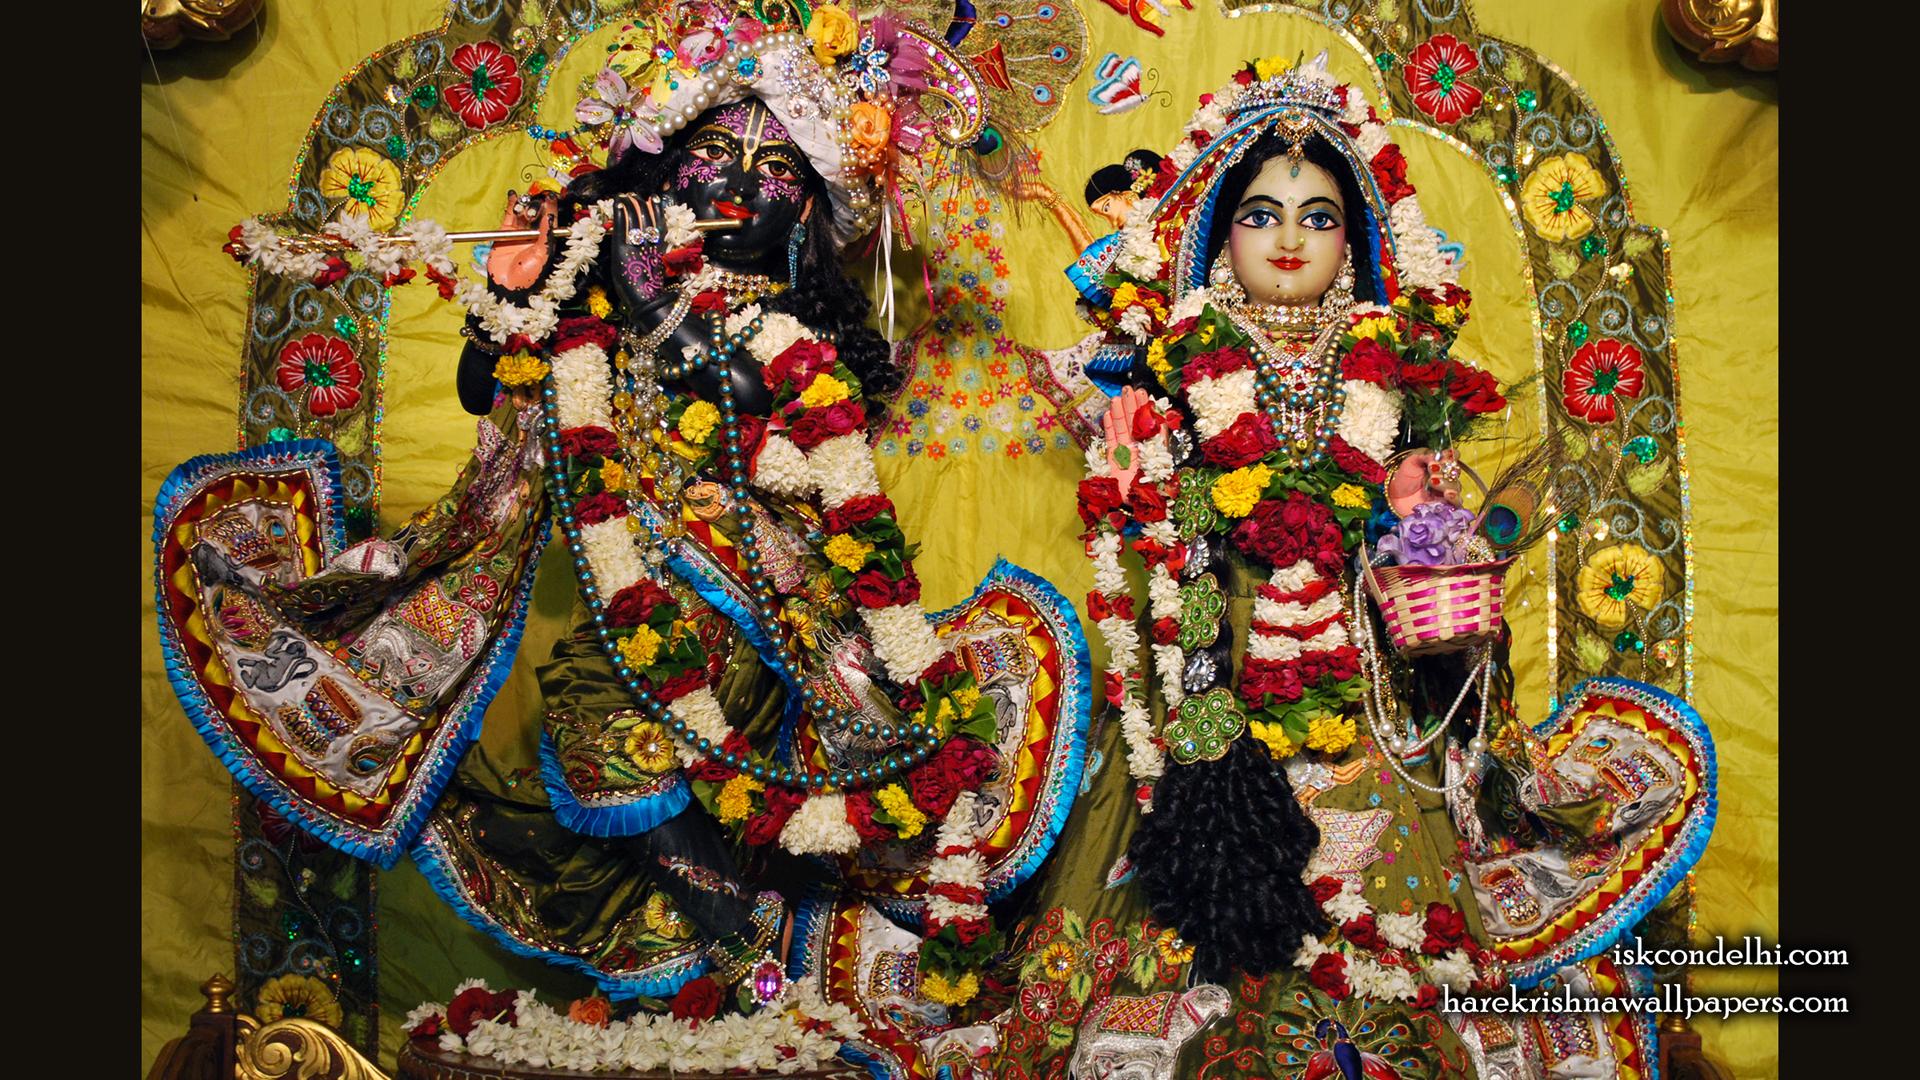 Sri Sri Radha Parthasarathi Wallpaper (007) Size 1920x1080 Download